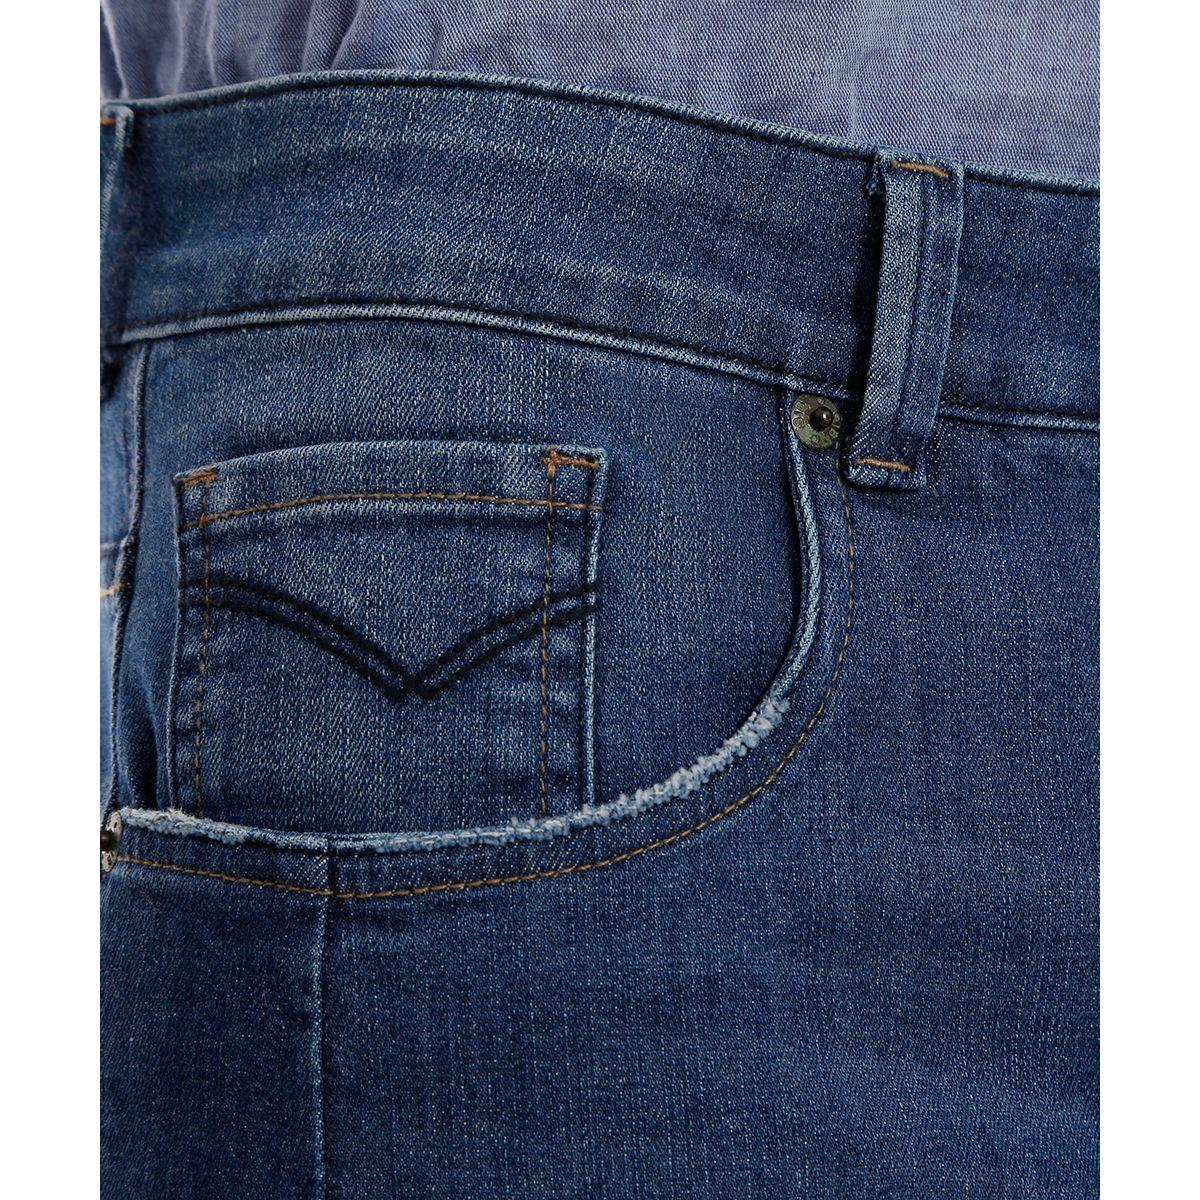 Calca-5-Pockets-Azul---46